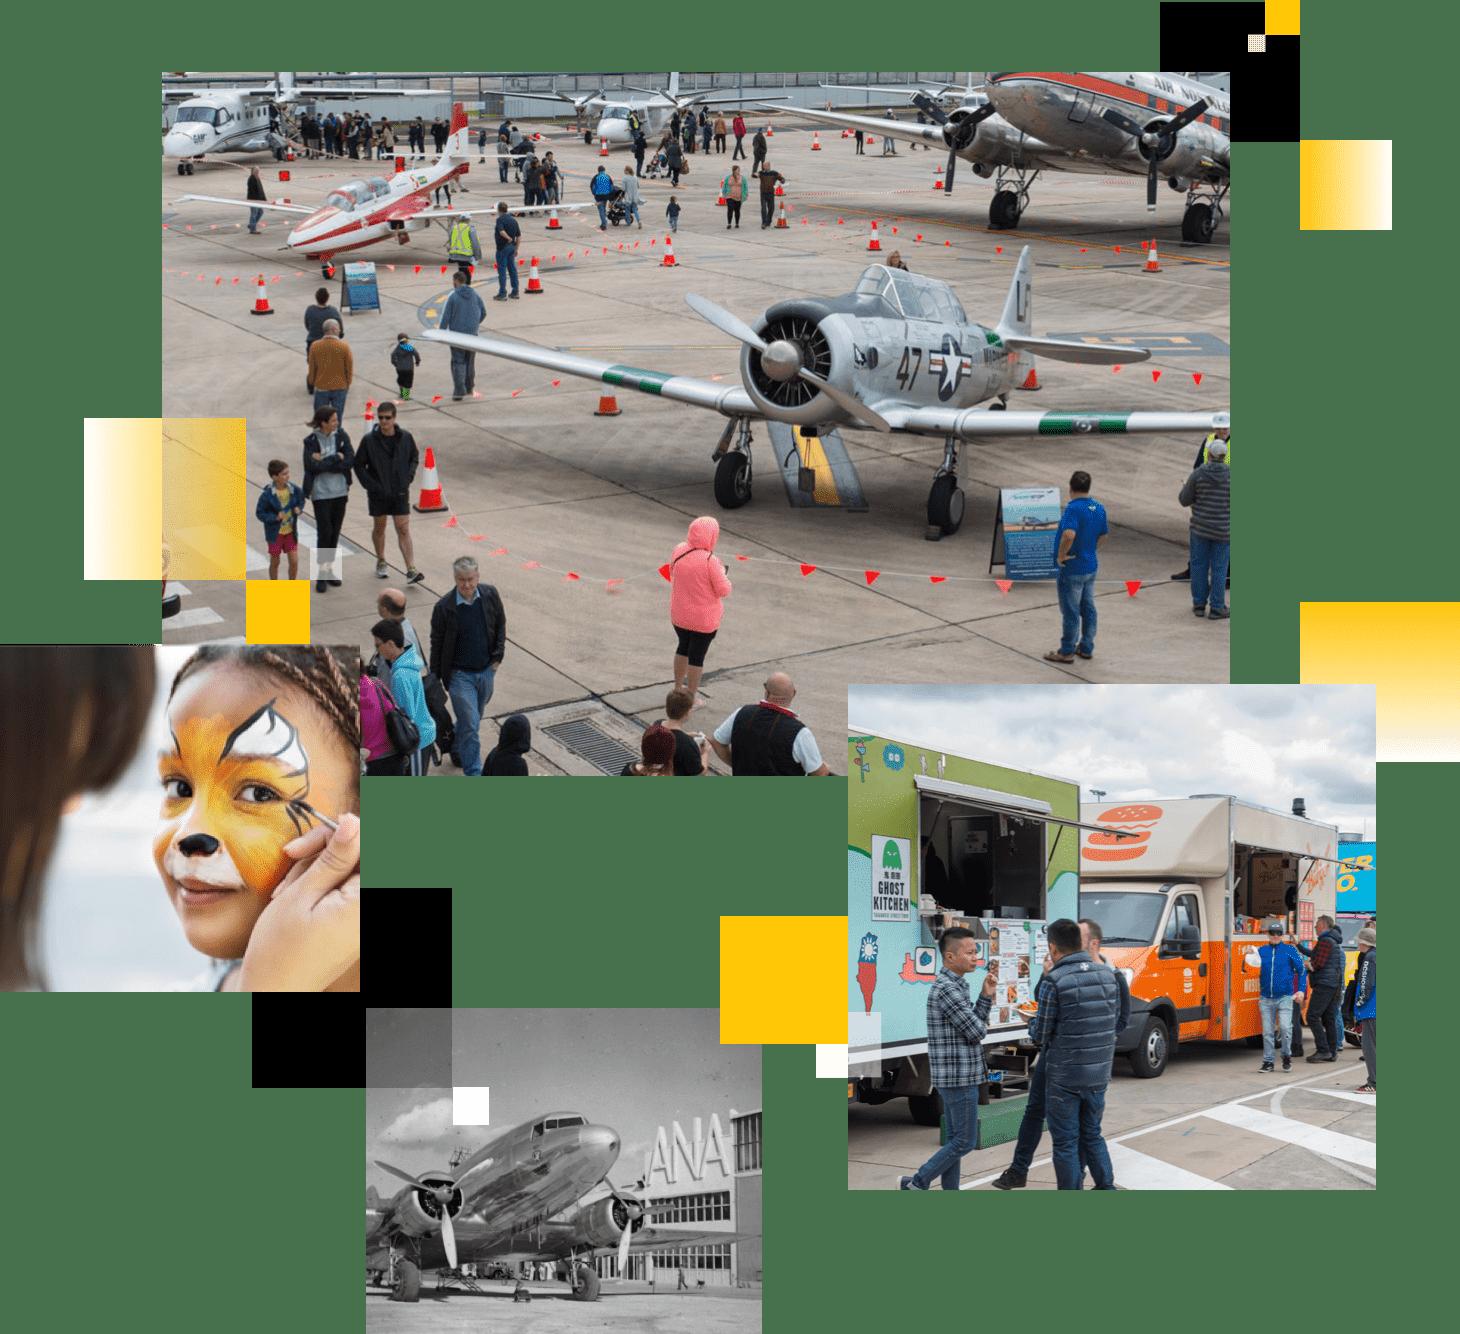 Community event activities